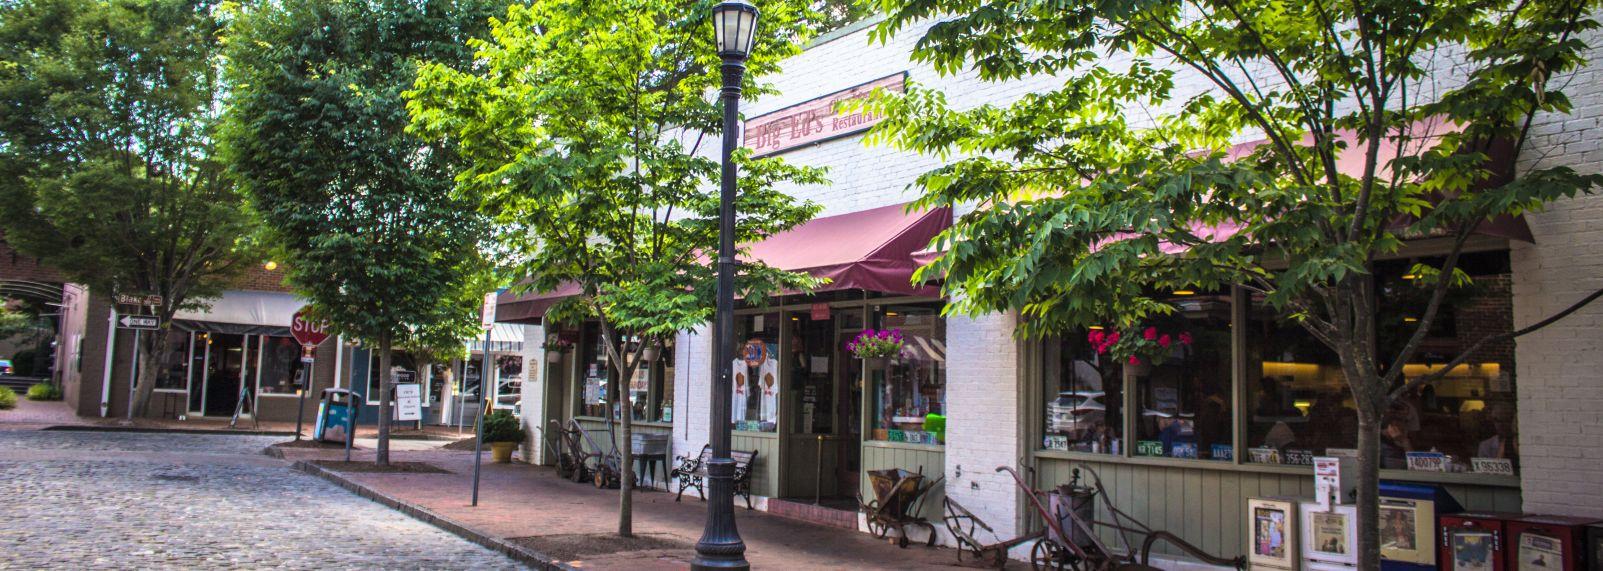 City_Market_Moore_Square_29.JPG